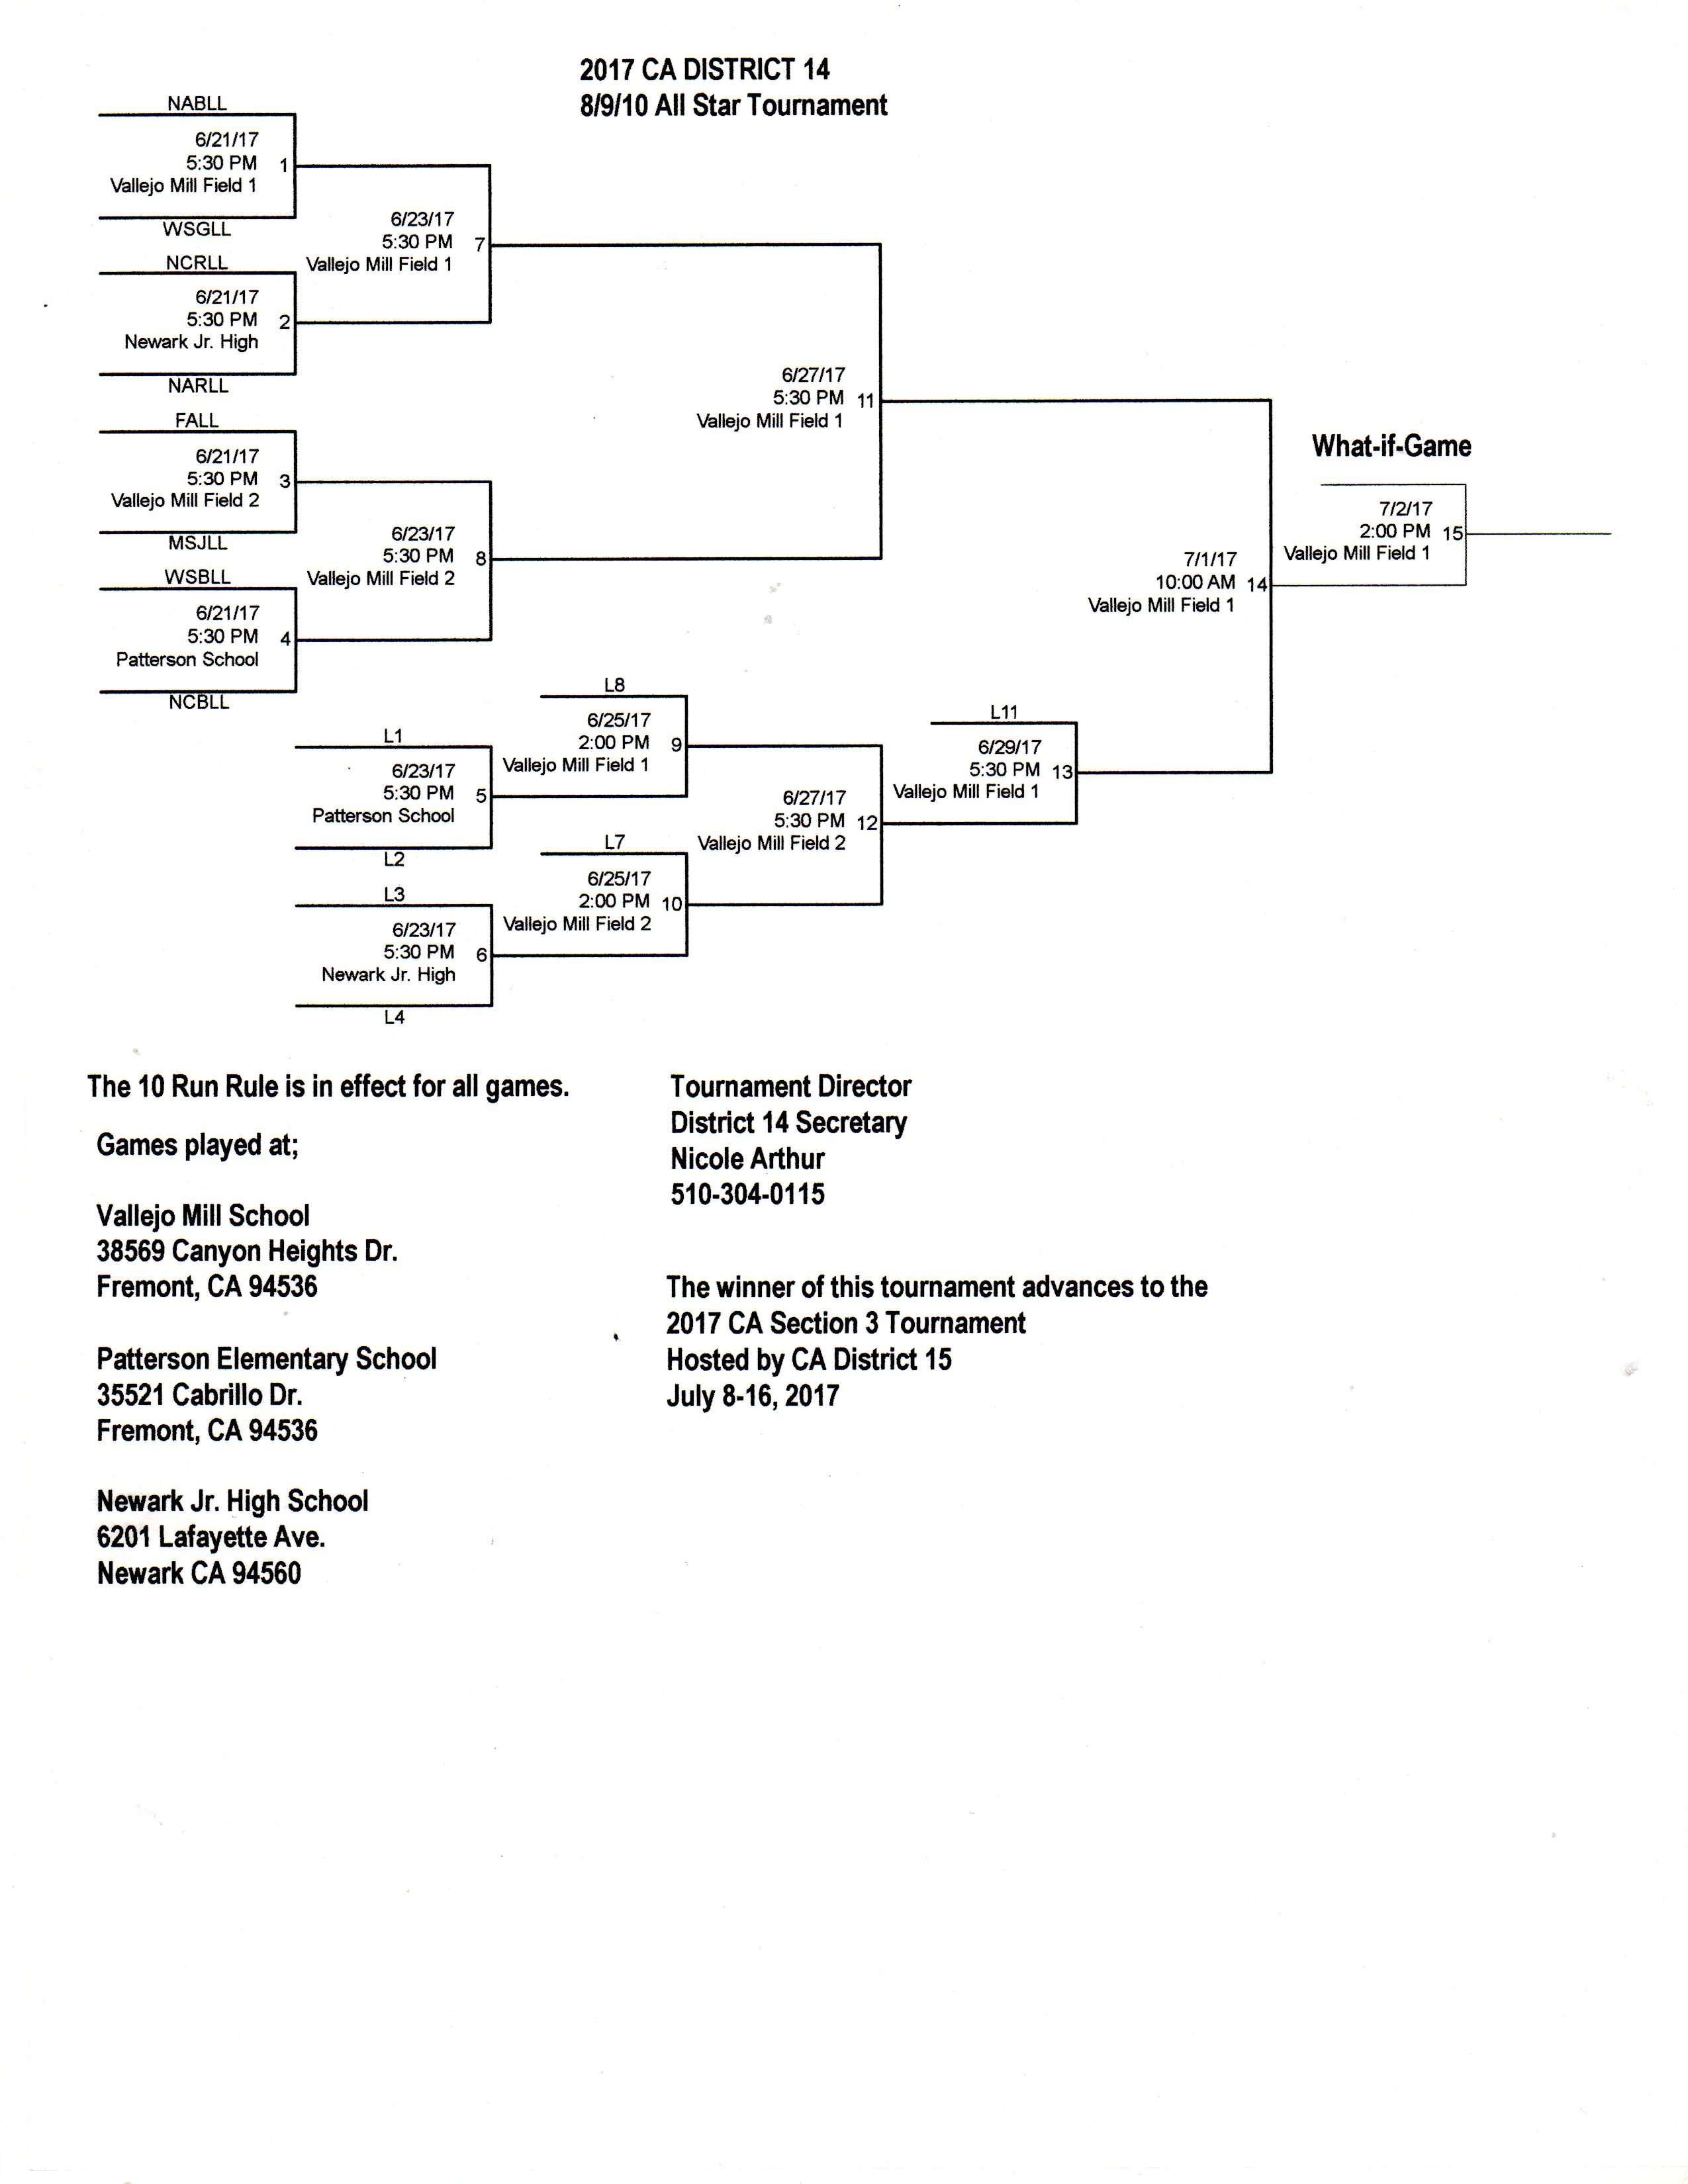 2017 CA District 14 8-9-10 Tournament